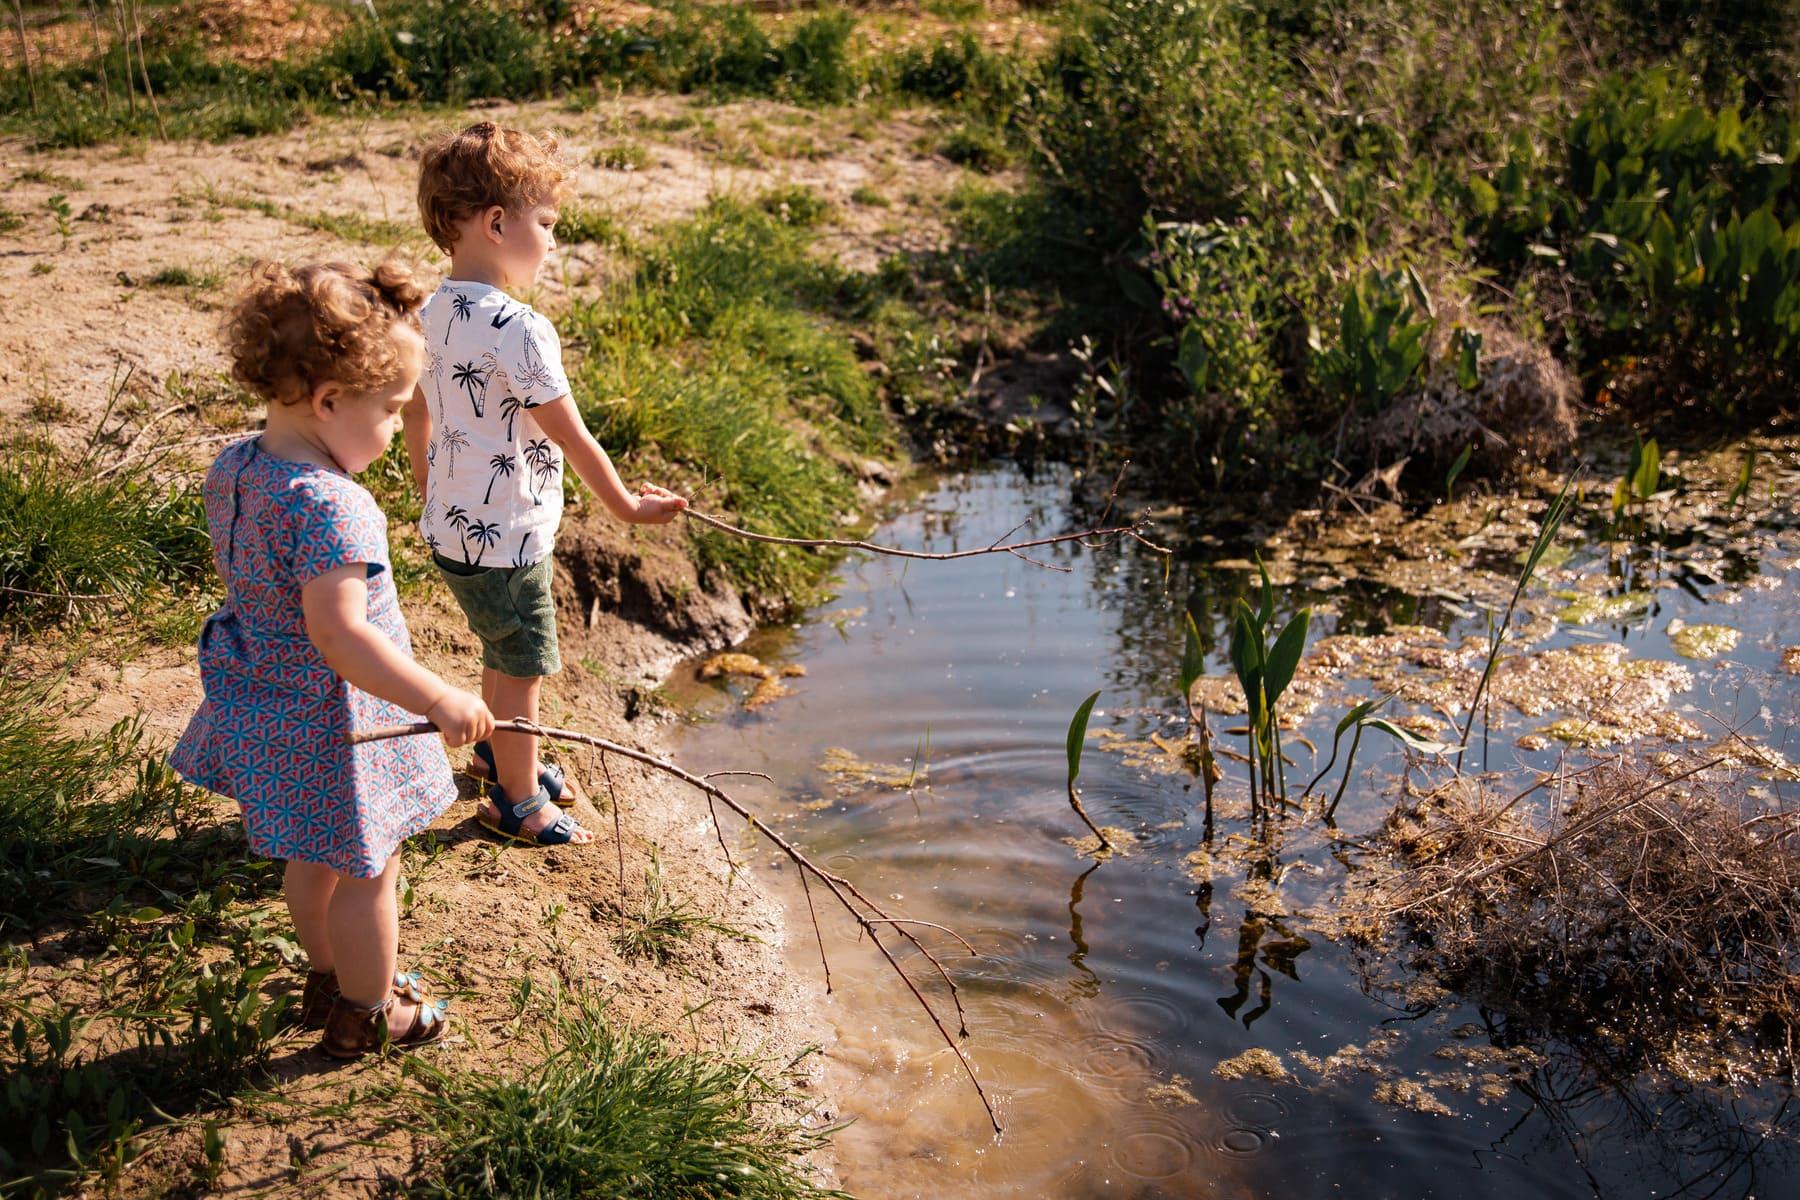 Kasteelhoeve Wange activiteiten rond domein familie & vrienden kinderen natuur rivier water Landen